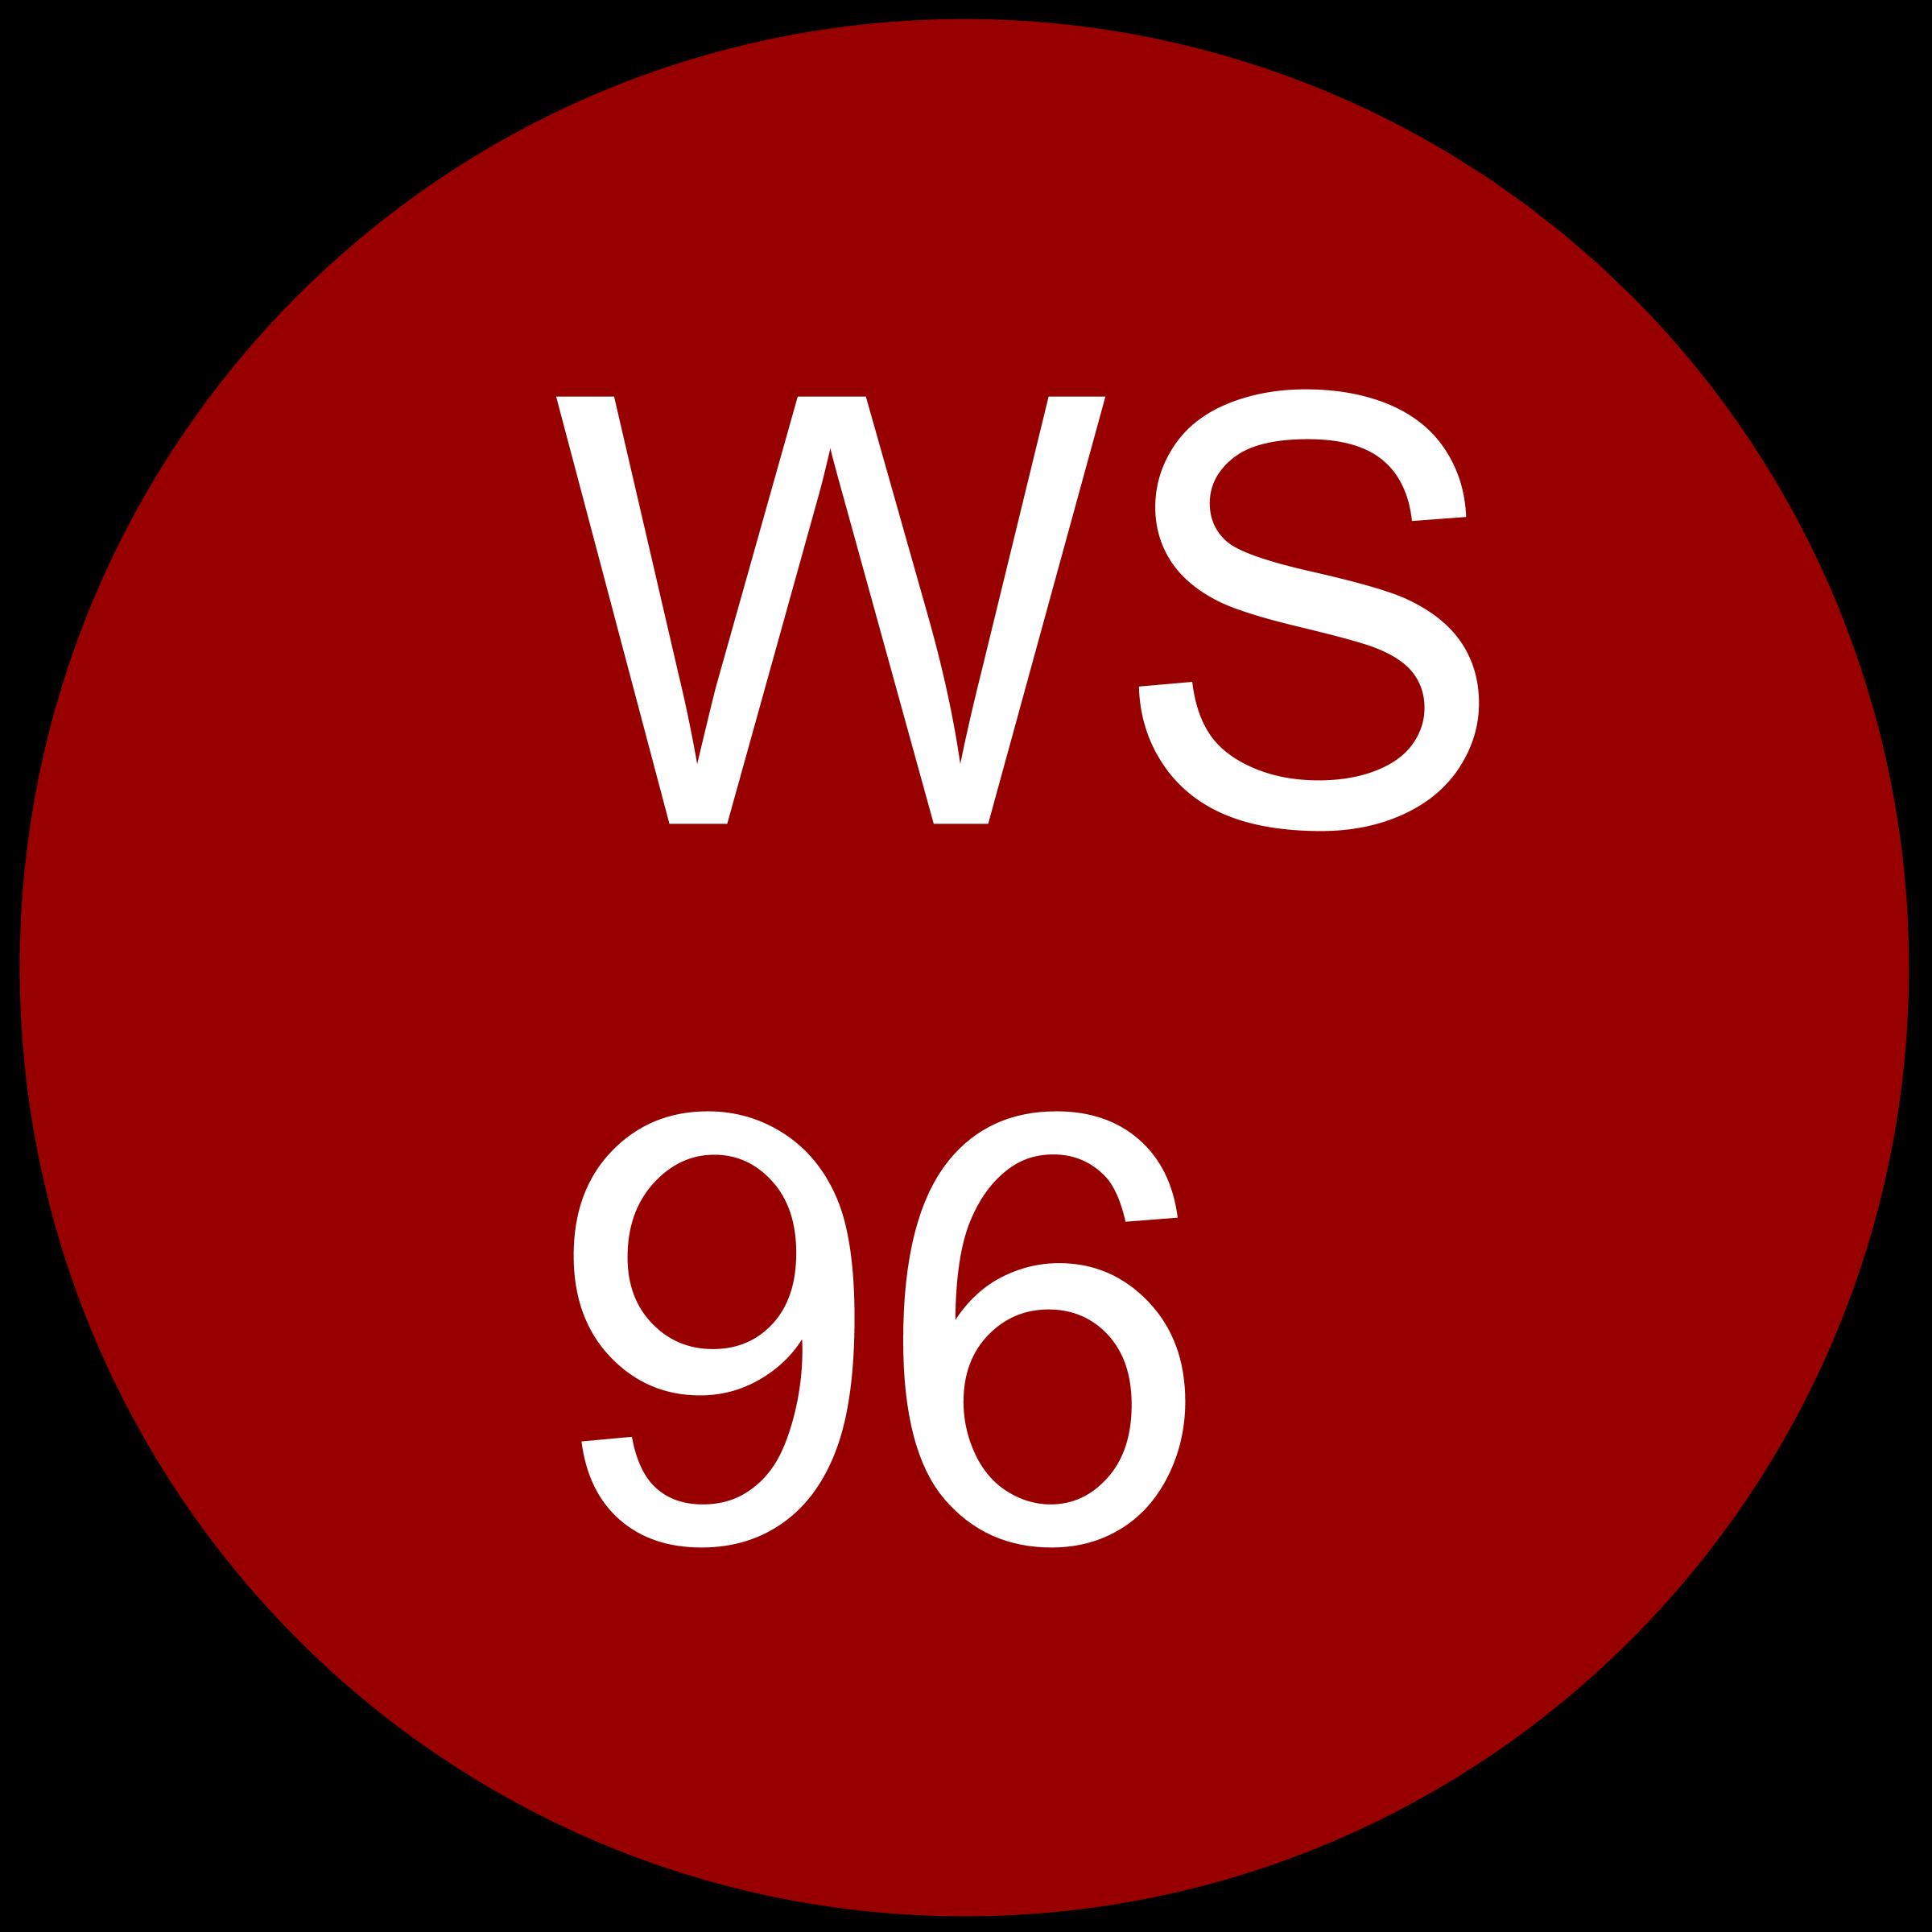 wine-spectator-96-ratings